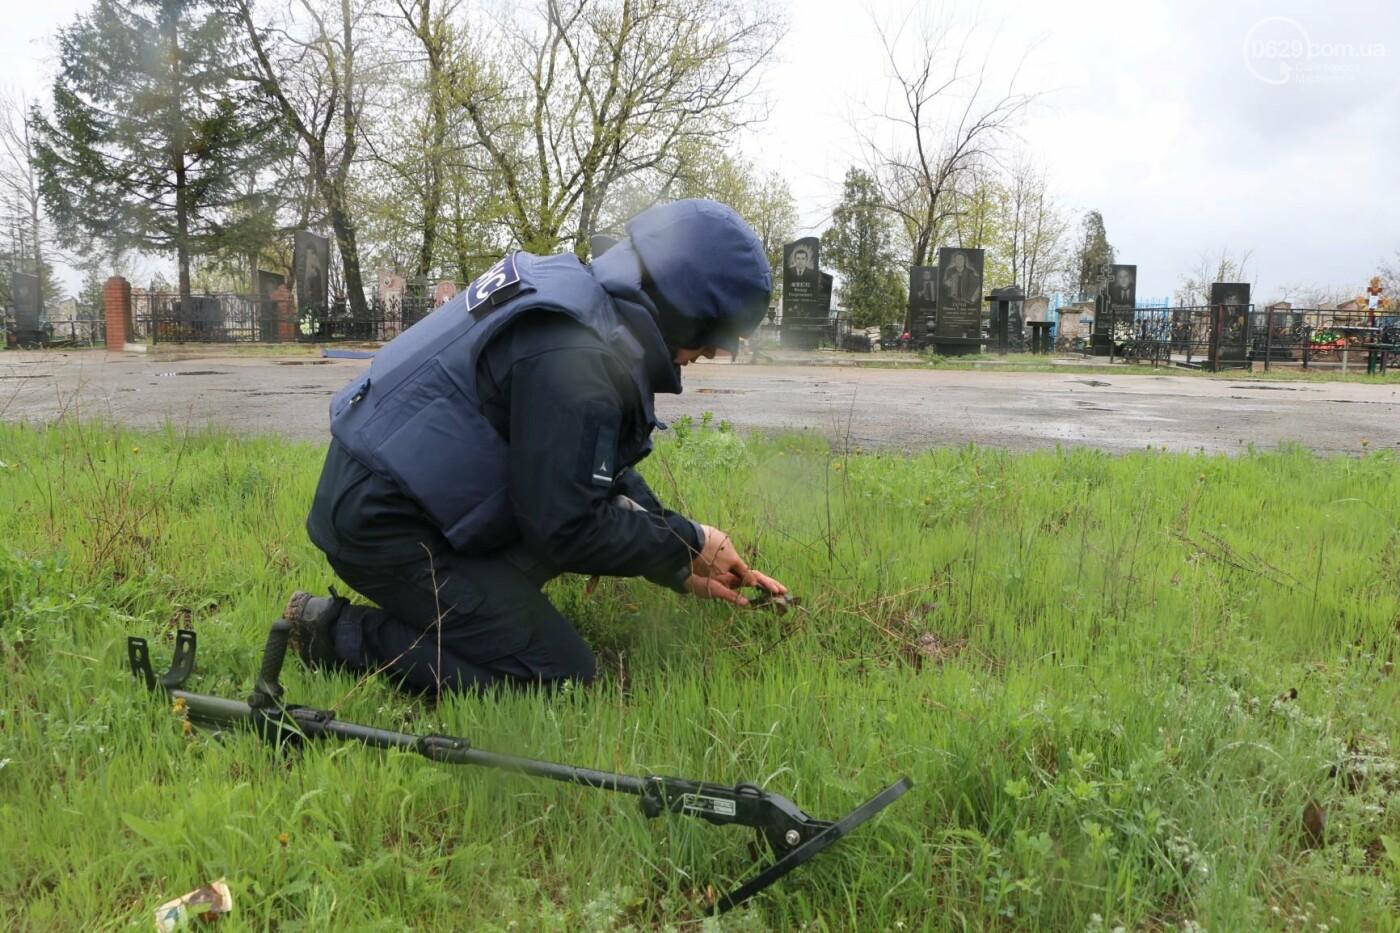 Пиротехники начали проверять безопасность кладбищ Мариуполя,- ФОТО, ВИДЕО, фото-8